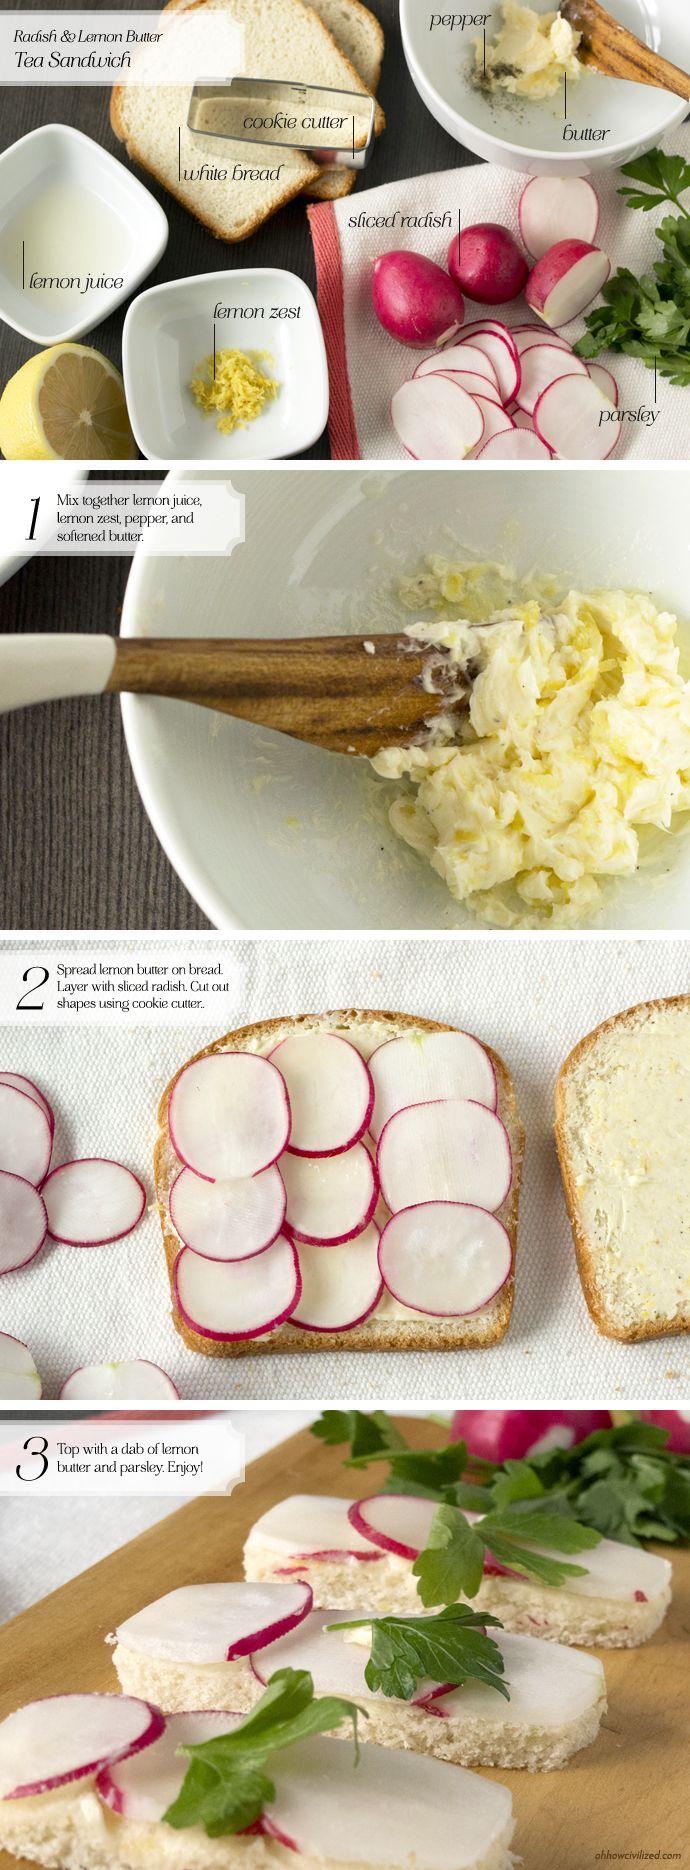 Tea Sandwich: Radish & Lemon butter | Tea T1m3 | Pinterest